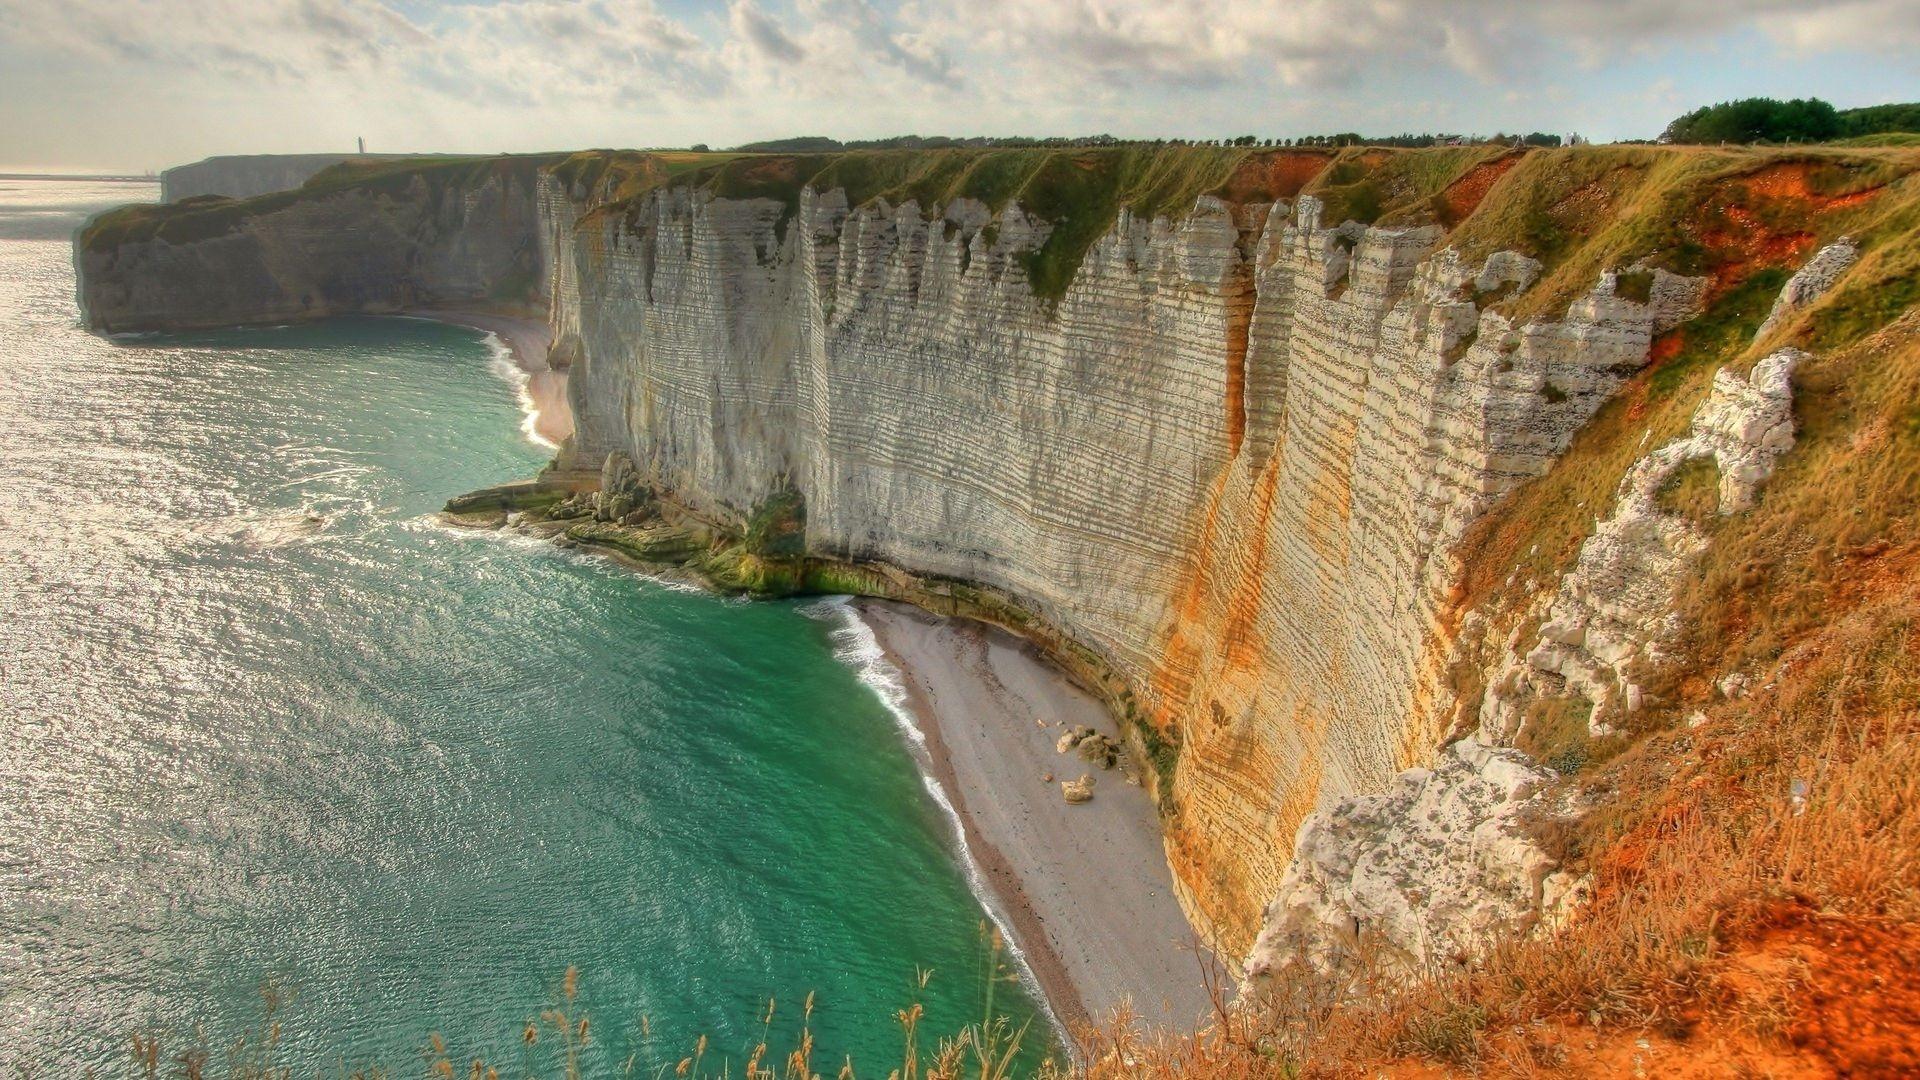 Cliff desktop wallpaper hd